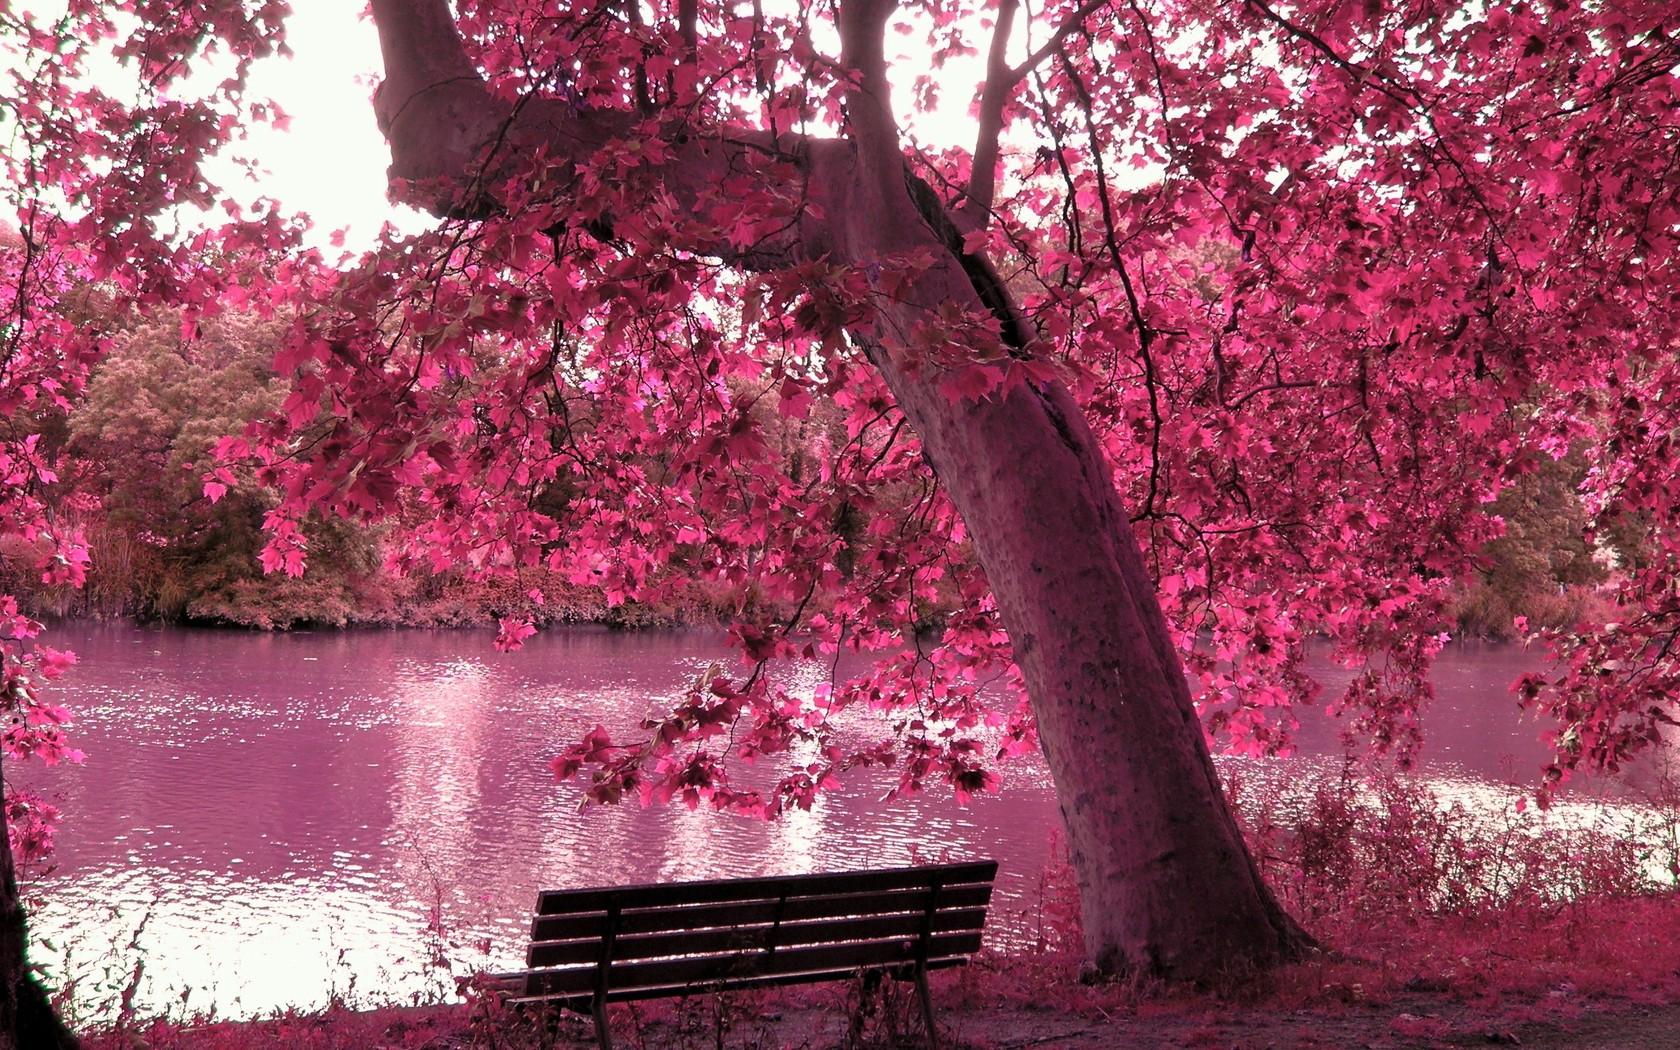 Spring Season 16801050 124611 HD Wallpaper Res 1680x1050 1680x1050